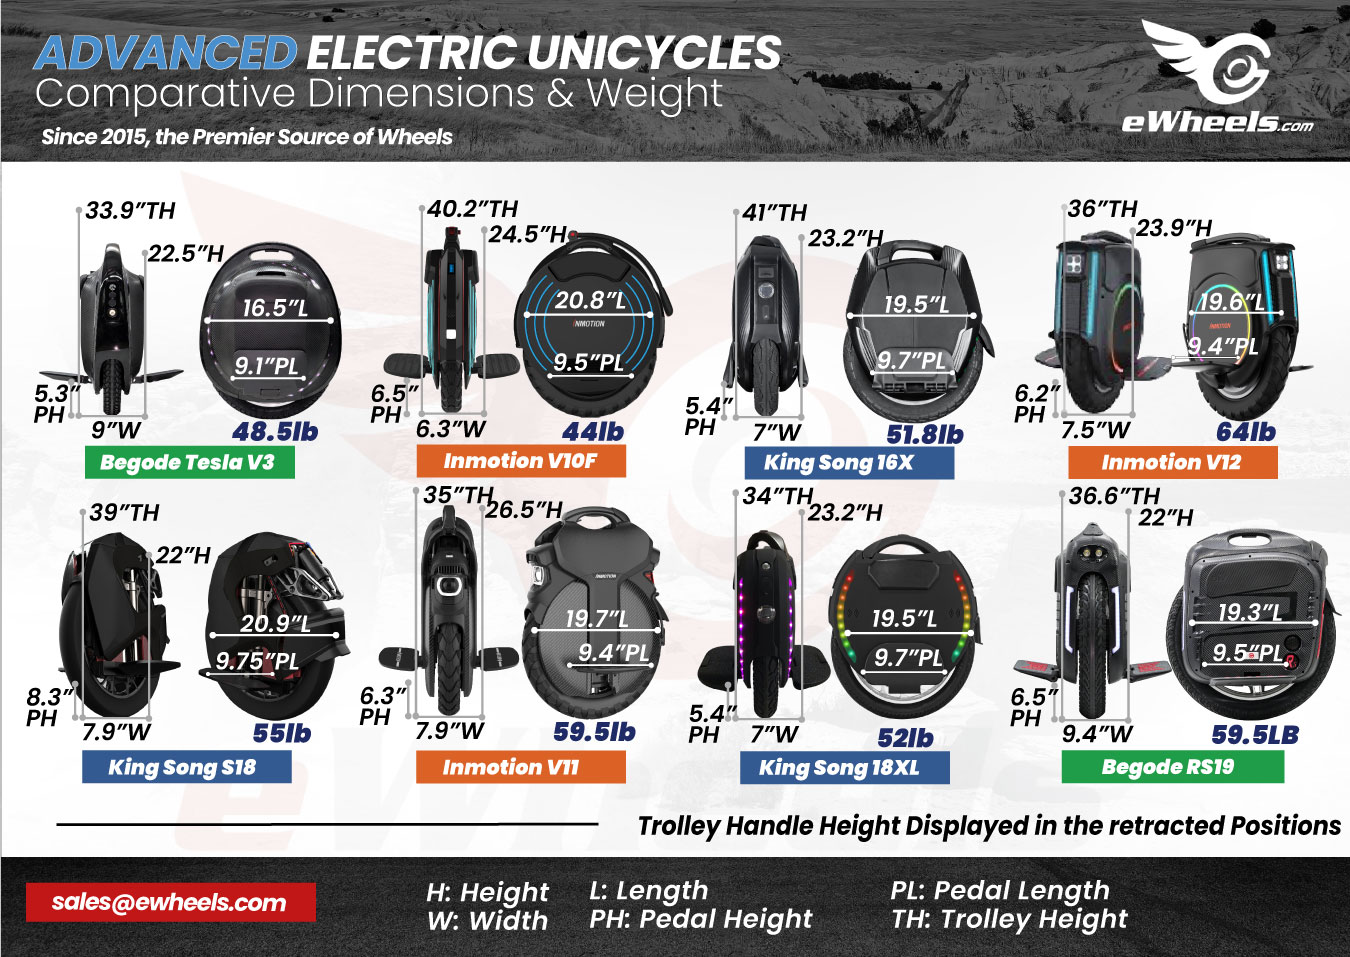 Advanced Electric Unicycle, Dimensions Weight Comparison, v1. Gotway Tesla V3 T3, Inmotion V10F, King Song 16X, Inmotion V12, S18, V11, 18XL, Begode RS 19